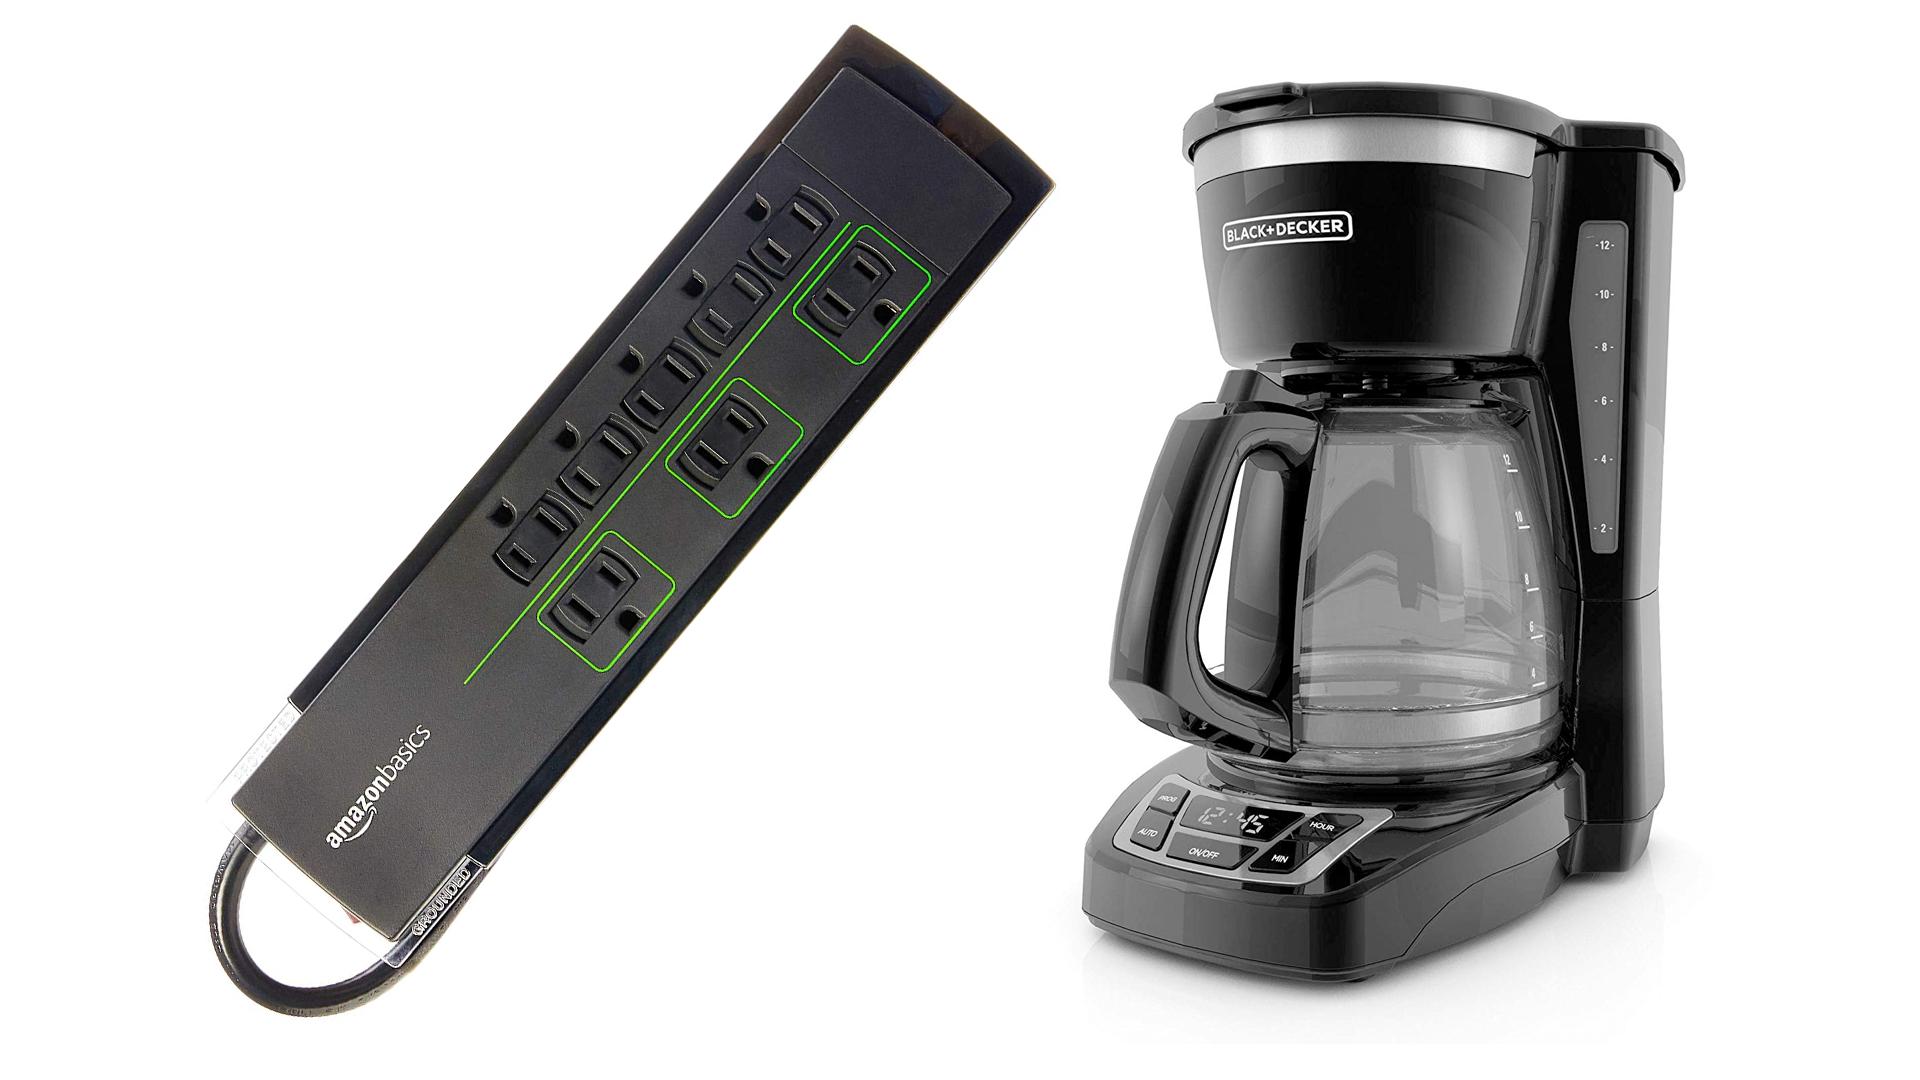 The AmazonBasics surge protector and the BLACK+DECKER coffeemaker.